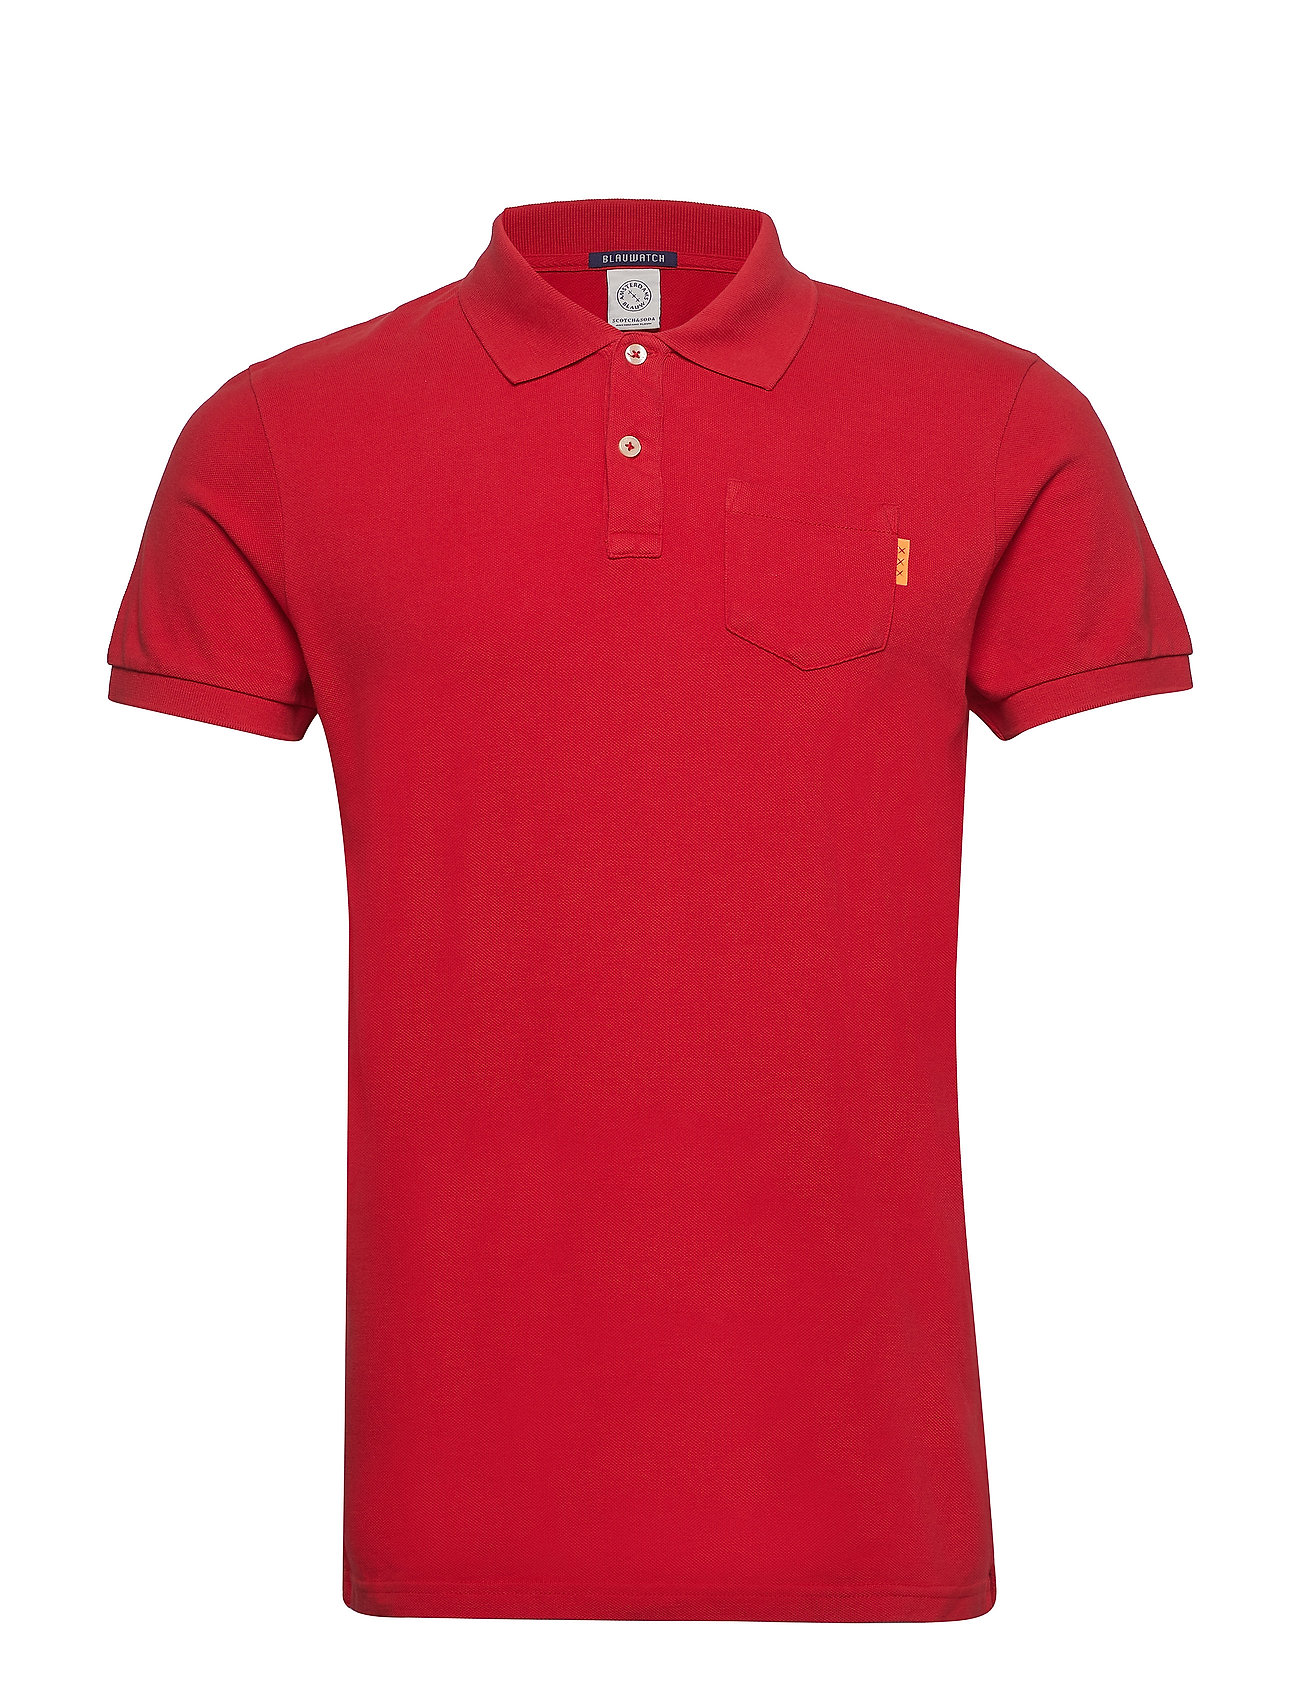 Soda Dyed Blauw Pololifeguard Garment RedScotchamp; m8N0vnw